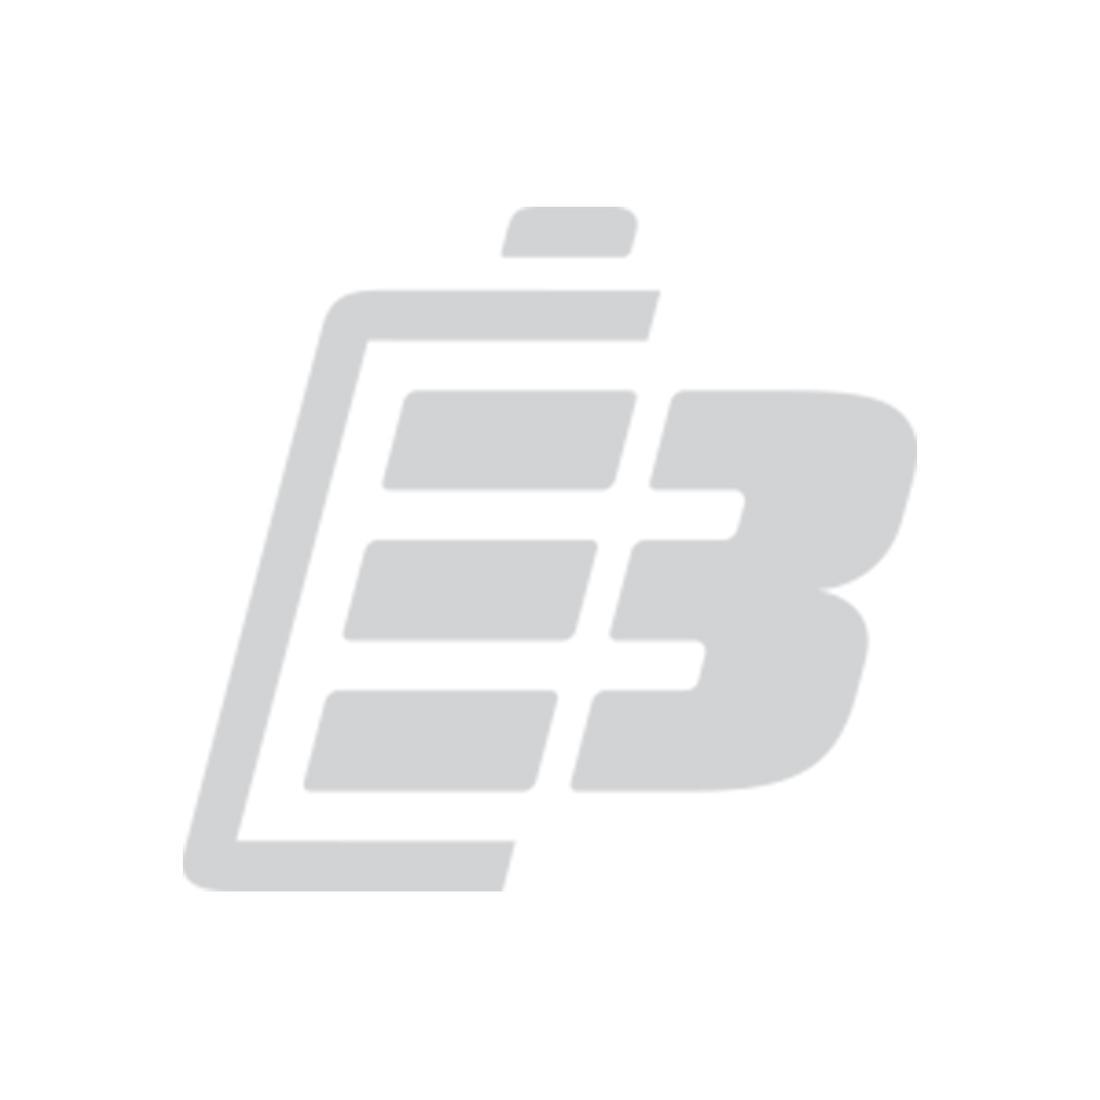 MPD Battery Holder 1_AAA